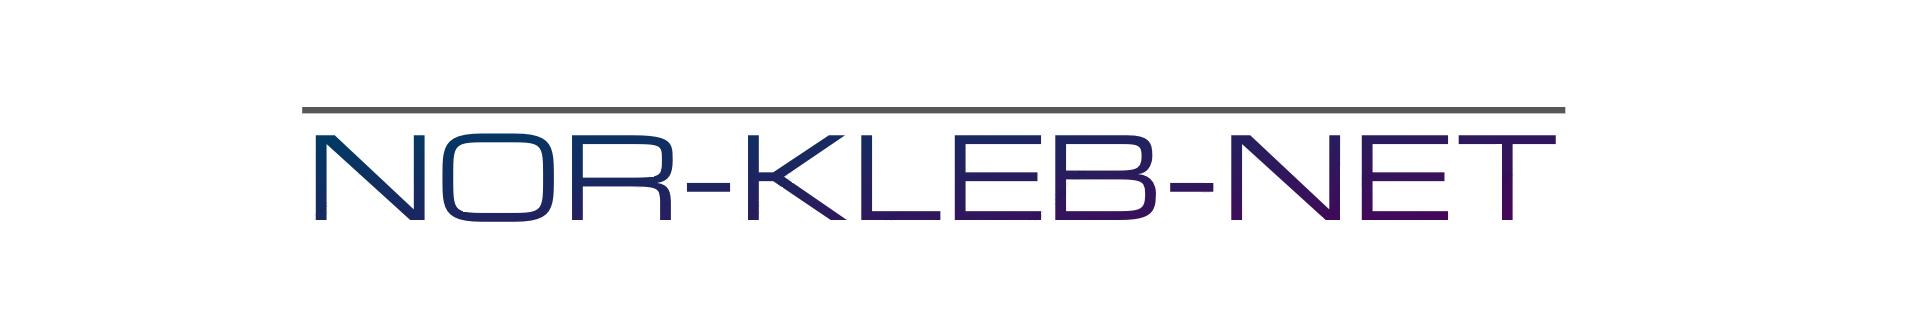 Klebsiella Homemade banner